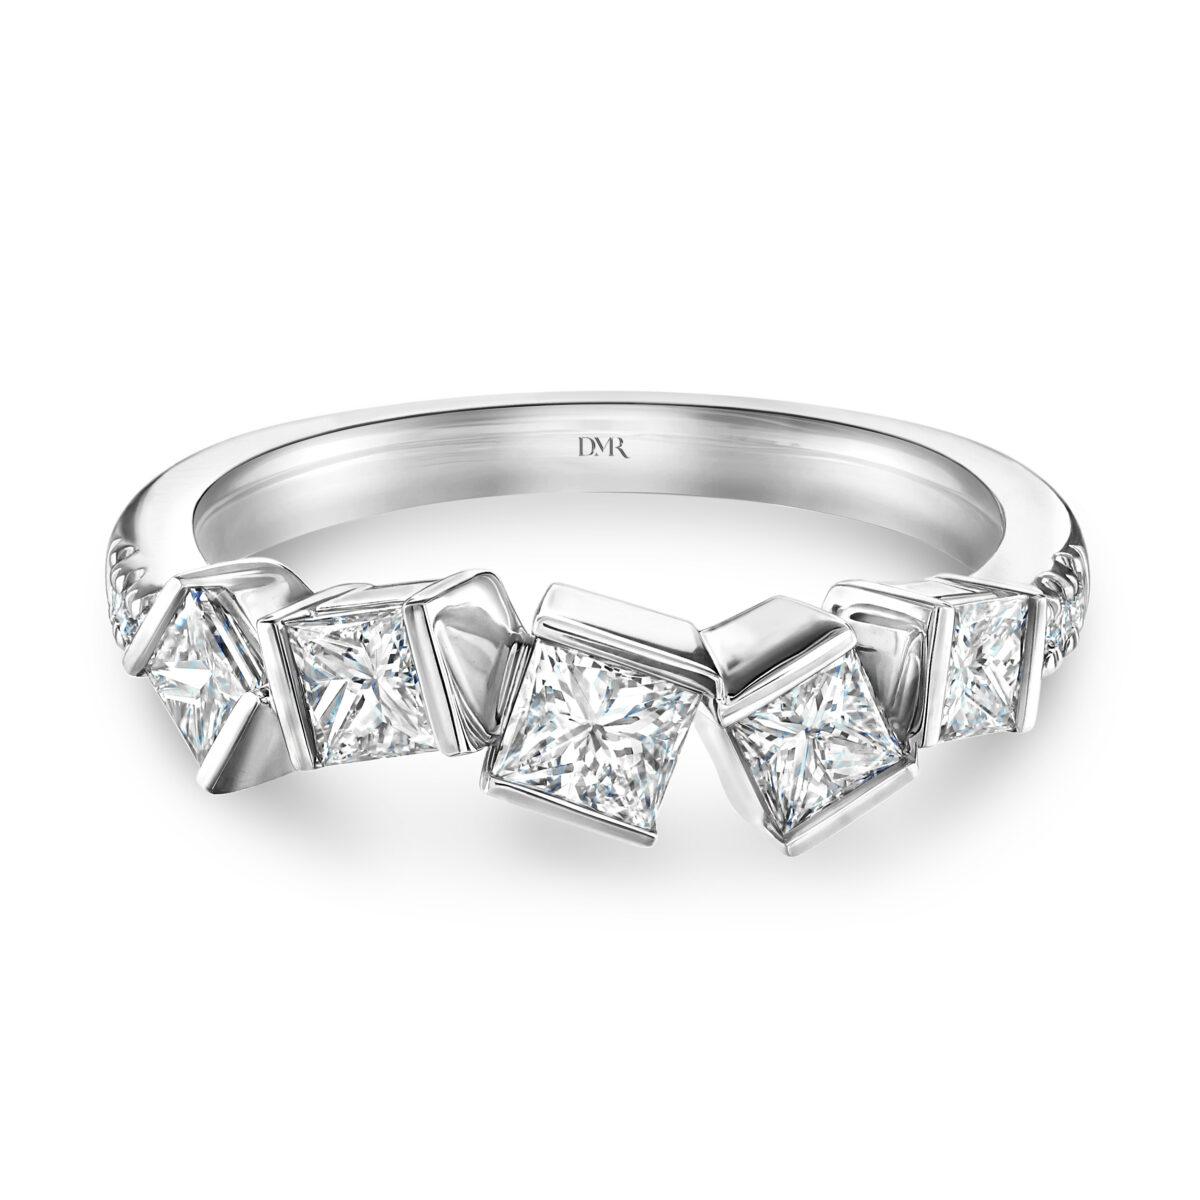 Hopscotch White Gold Diamond Ring